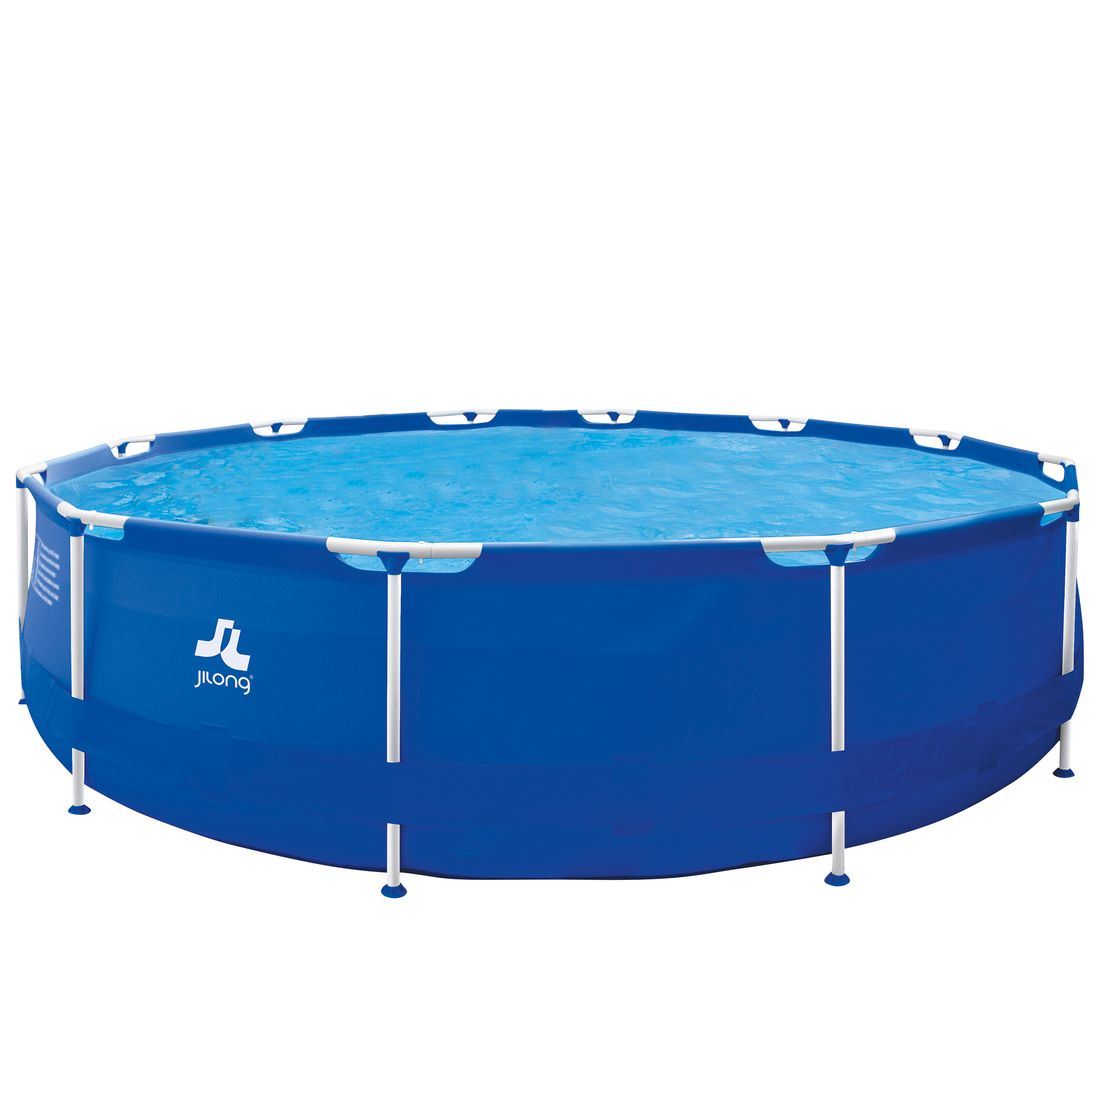 Jilong runder XXL Family Pool Ø 420 x 84 cm Stahlrahmen Schwimmbad Garten  Schwimmbad Familienpool Wassersport & Pools Pools & Spas Maxi-Pools